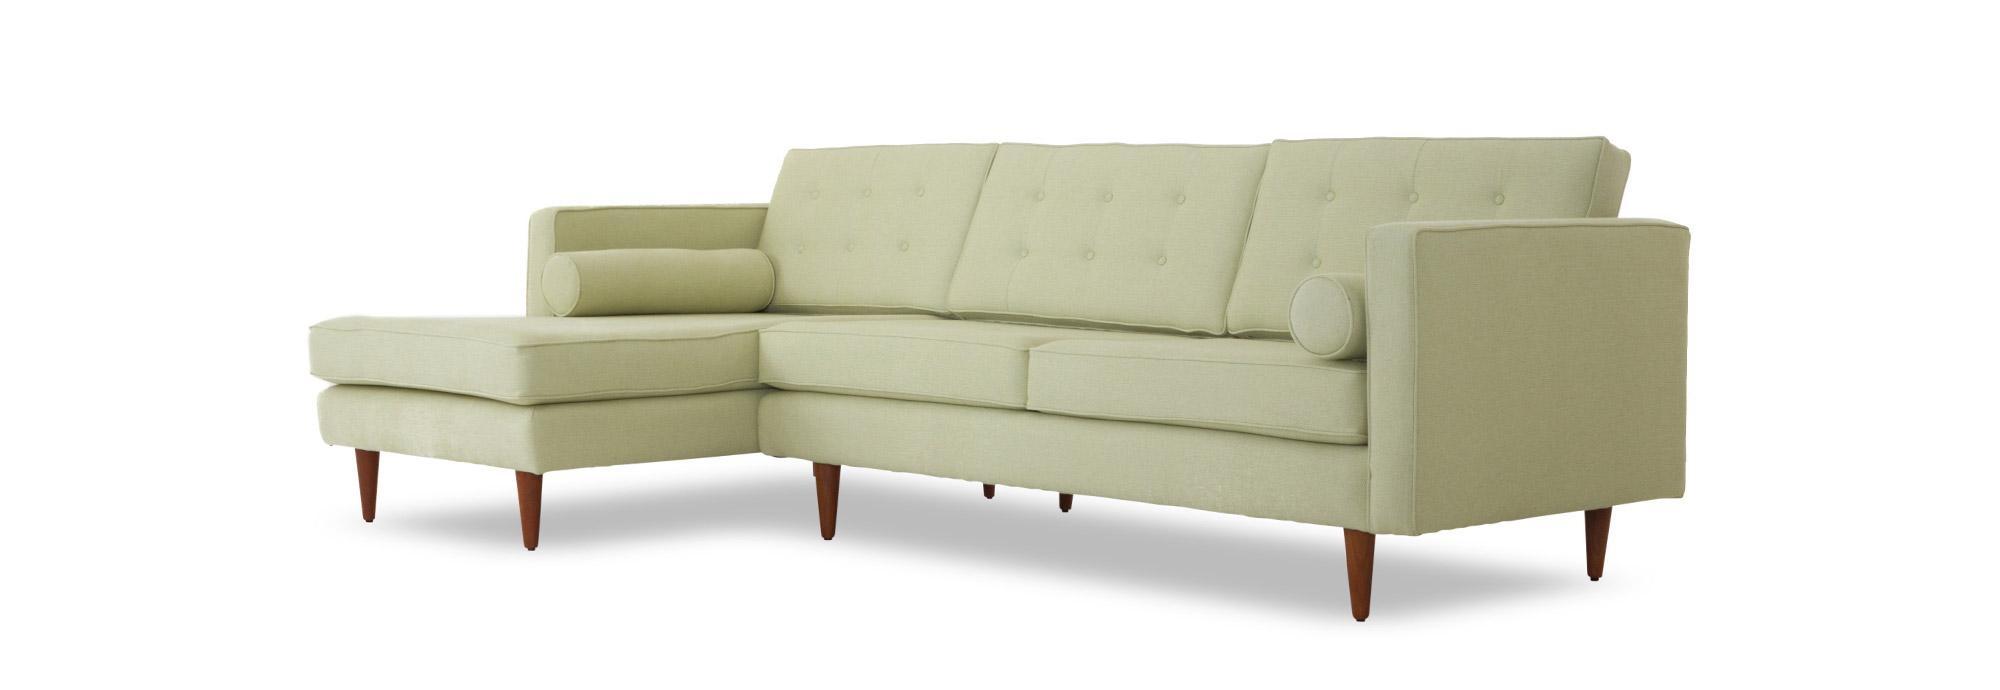 Braxton Sectional | Joybird Throughout Braxton Sectional Sofas (Image 6 of 20)